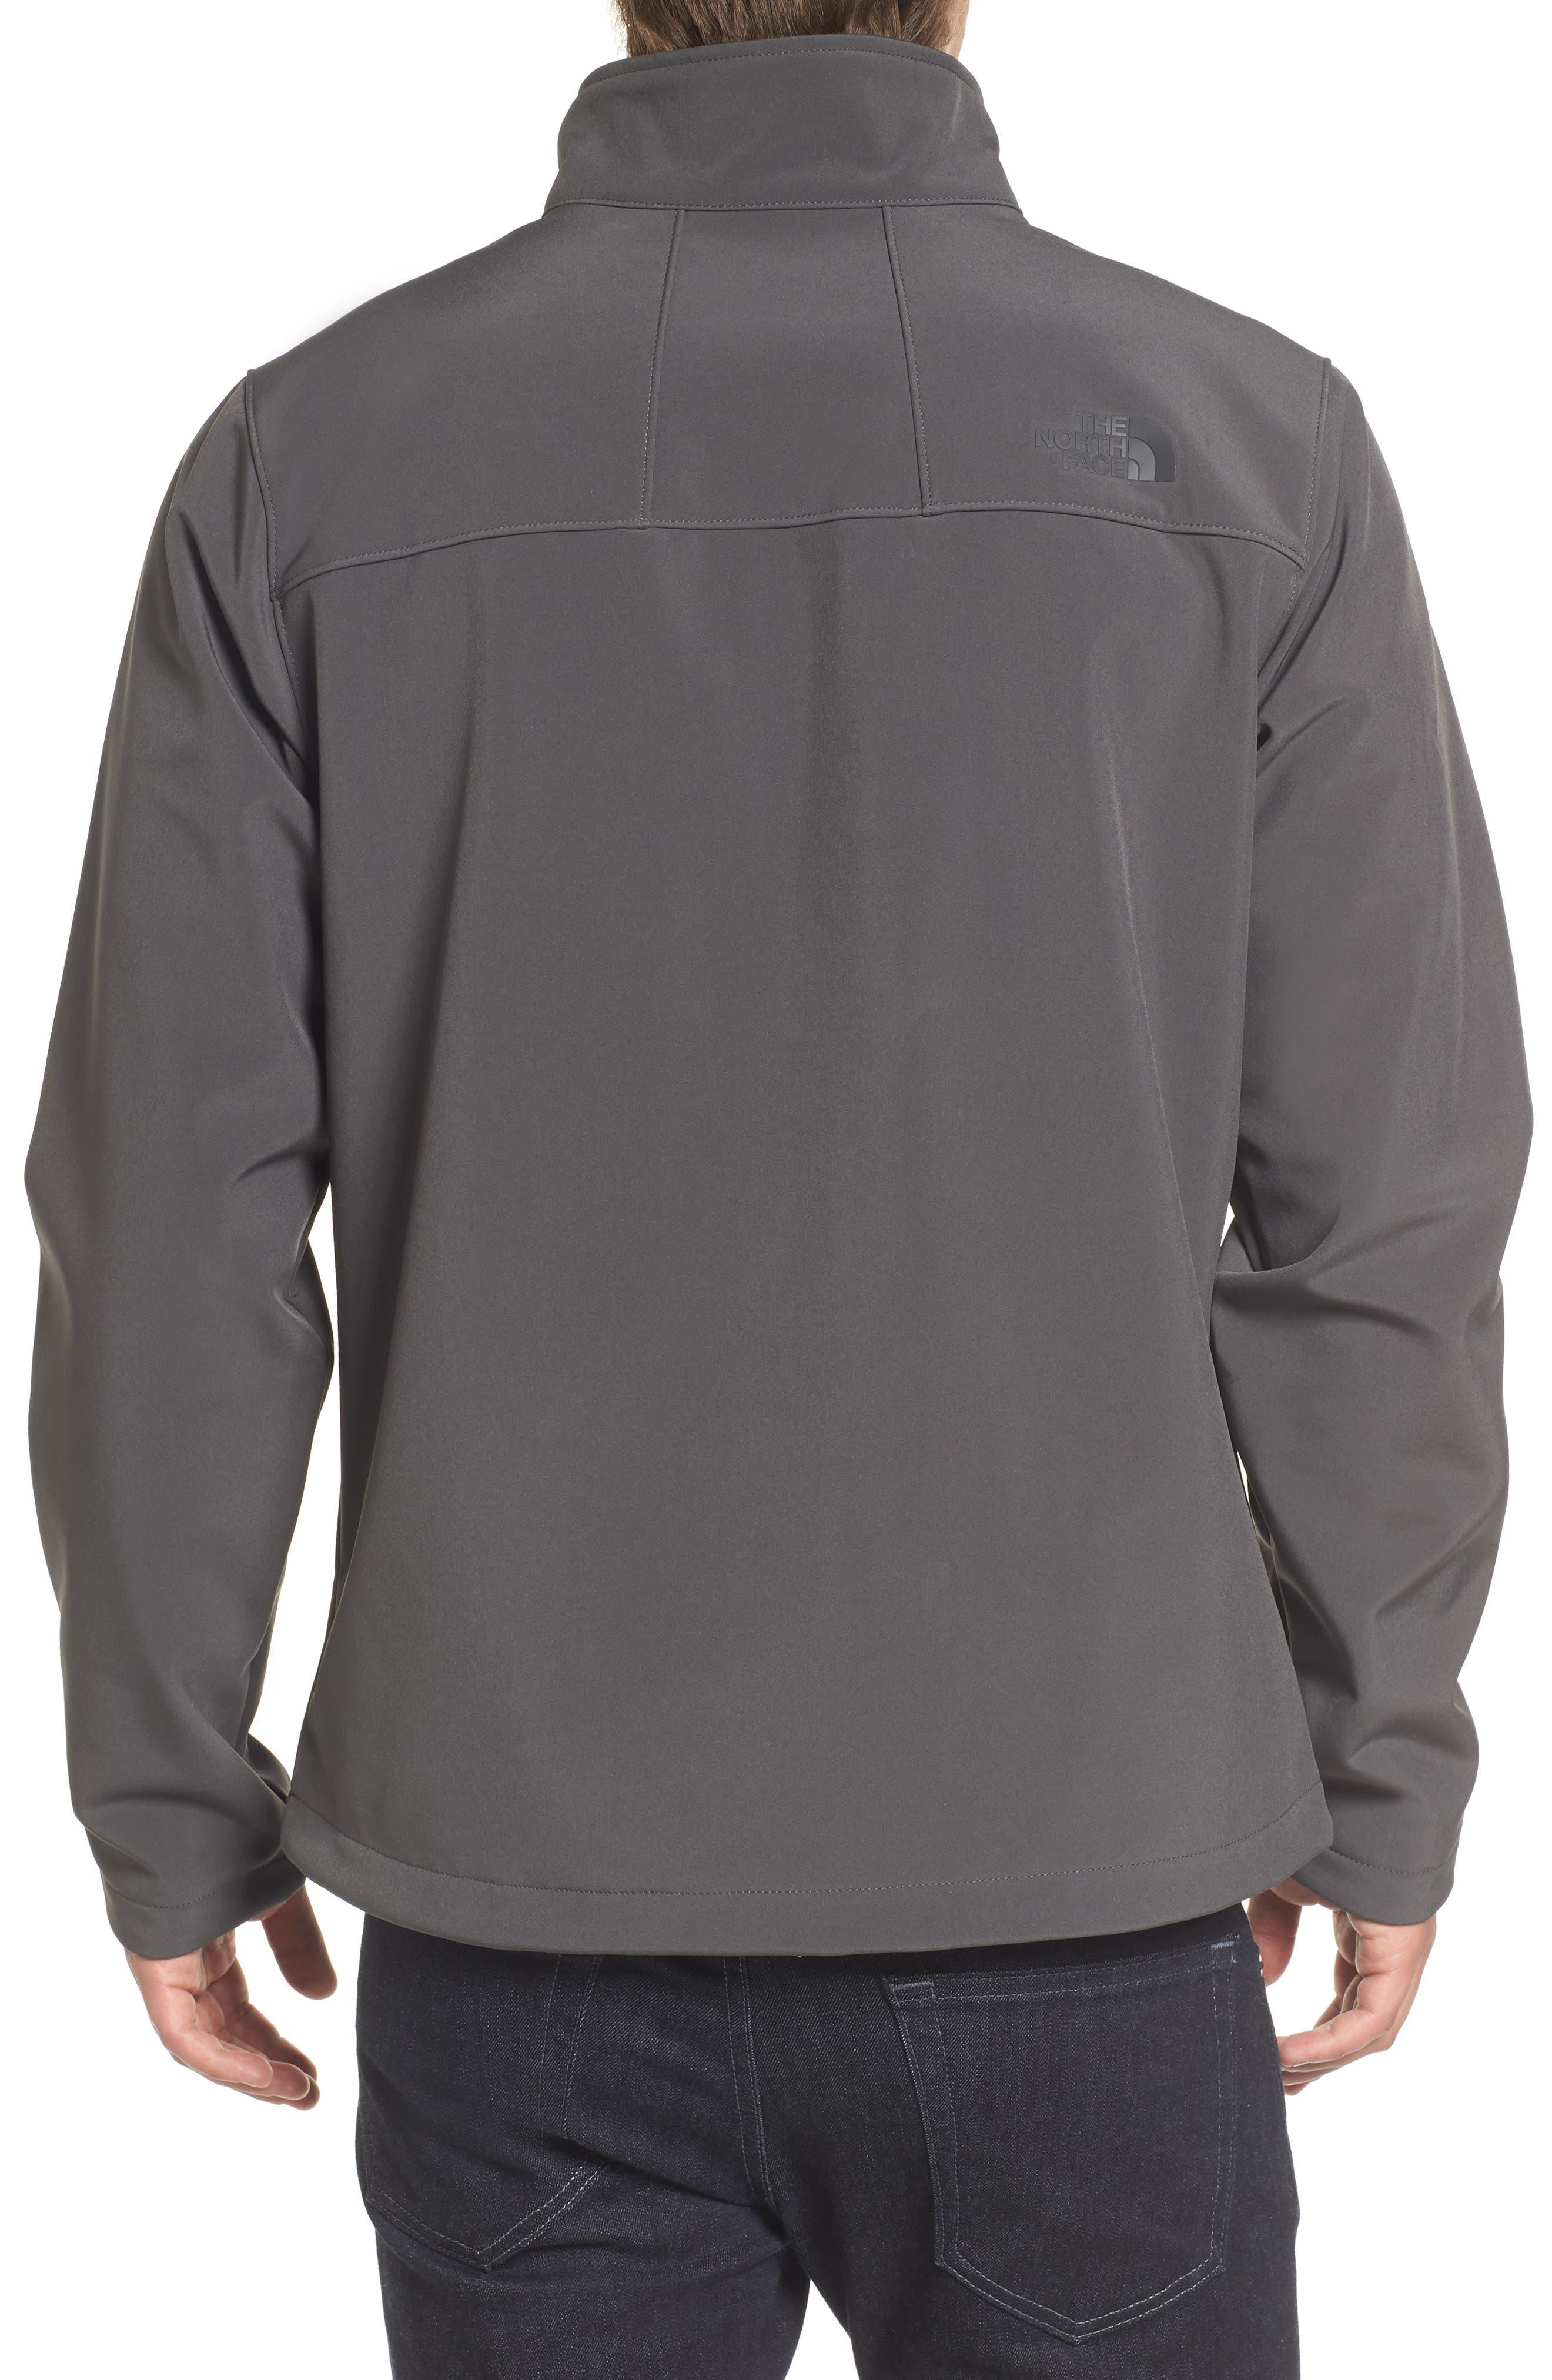 'Apex Bionic 2' Windproof & Water Resistant Soft Shell Jacket,                             Alternate thumbnail 2, color,                             ASPHALT GREY/ASPHALT GREY